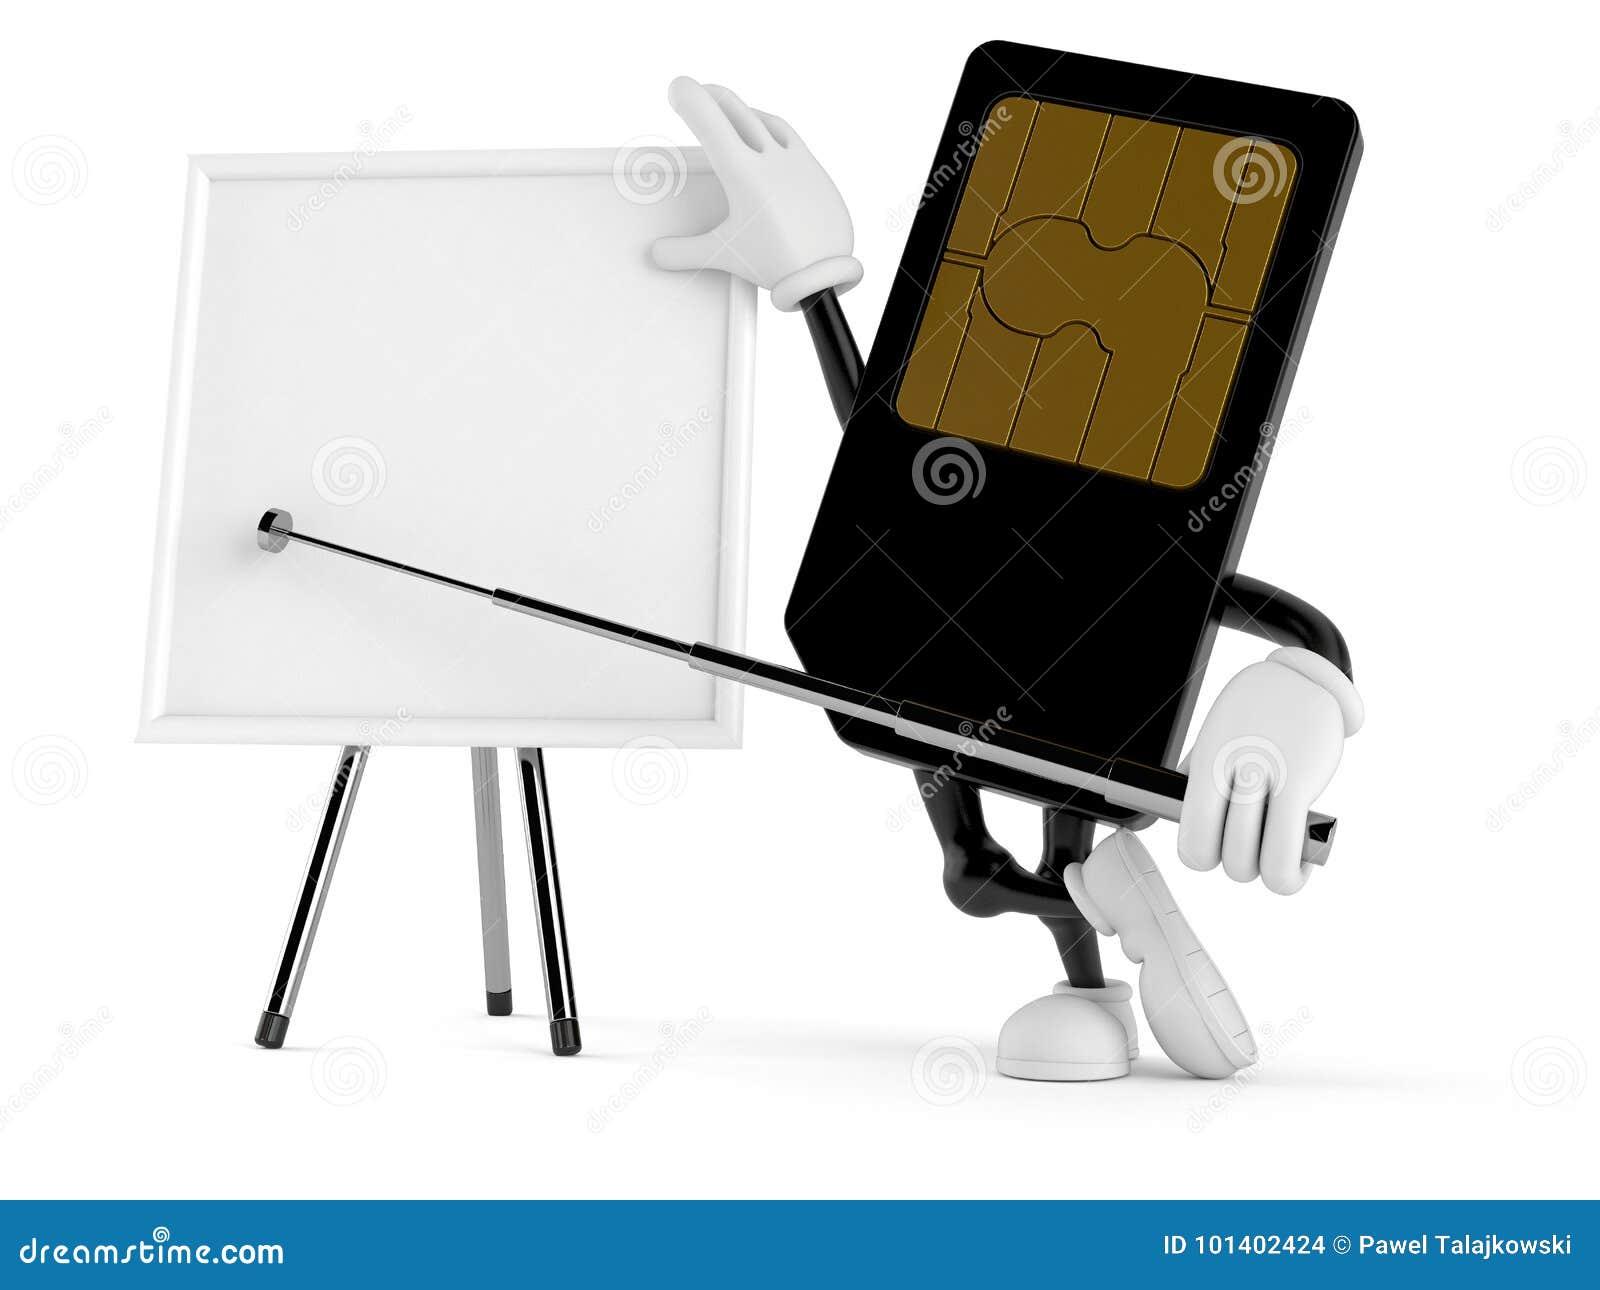 How to block a megaphone SIM card: 3 ways 8